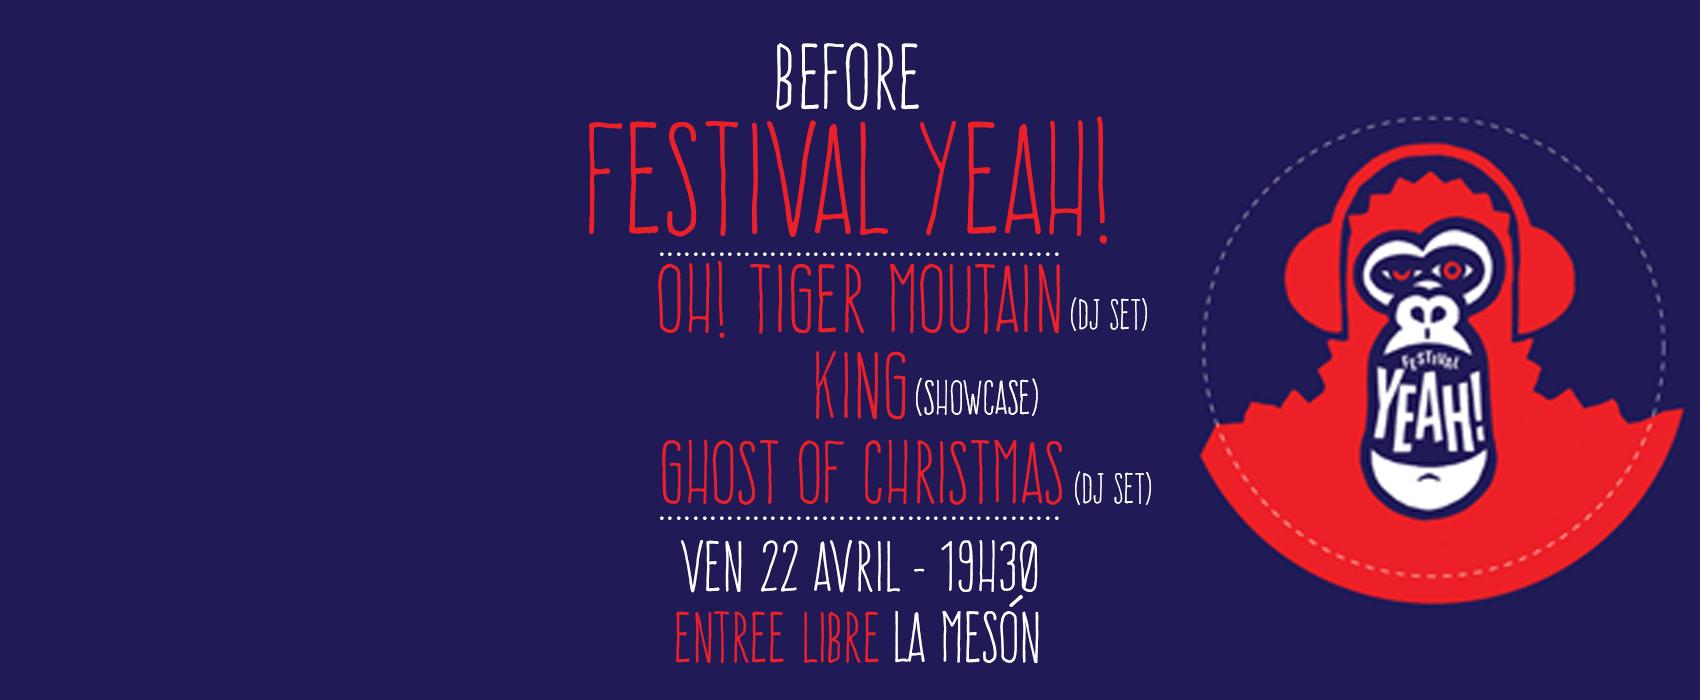 festival yeah